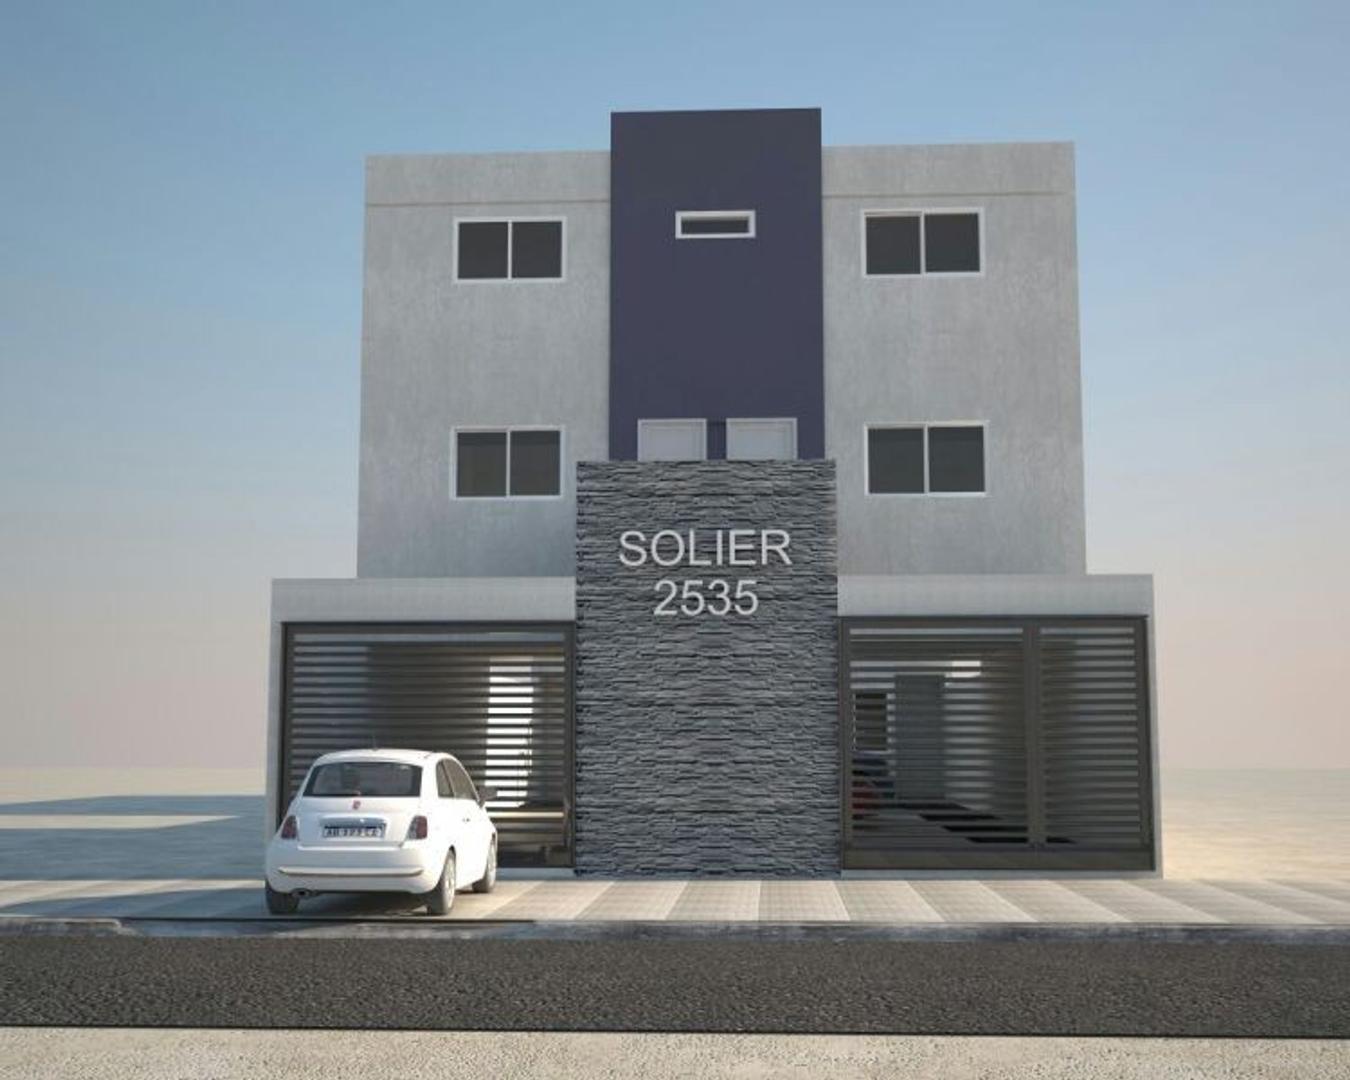 XINTEL(EMI-EMI-6) venta  ph de pozo, 3 ambientes cochera , Solier 2535 , Saran